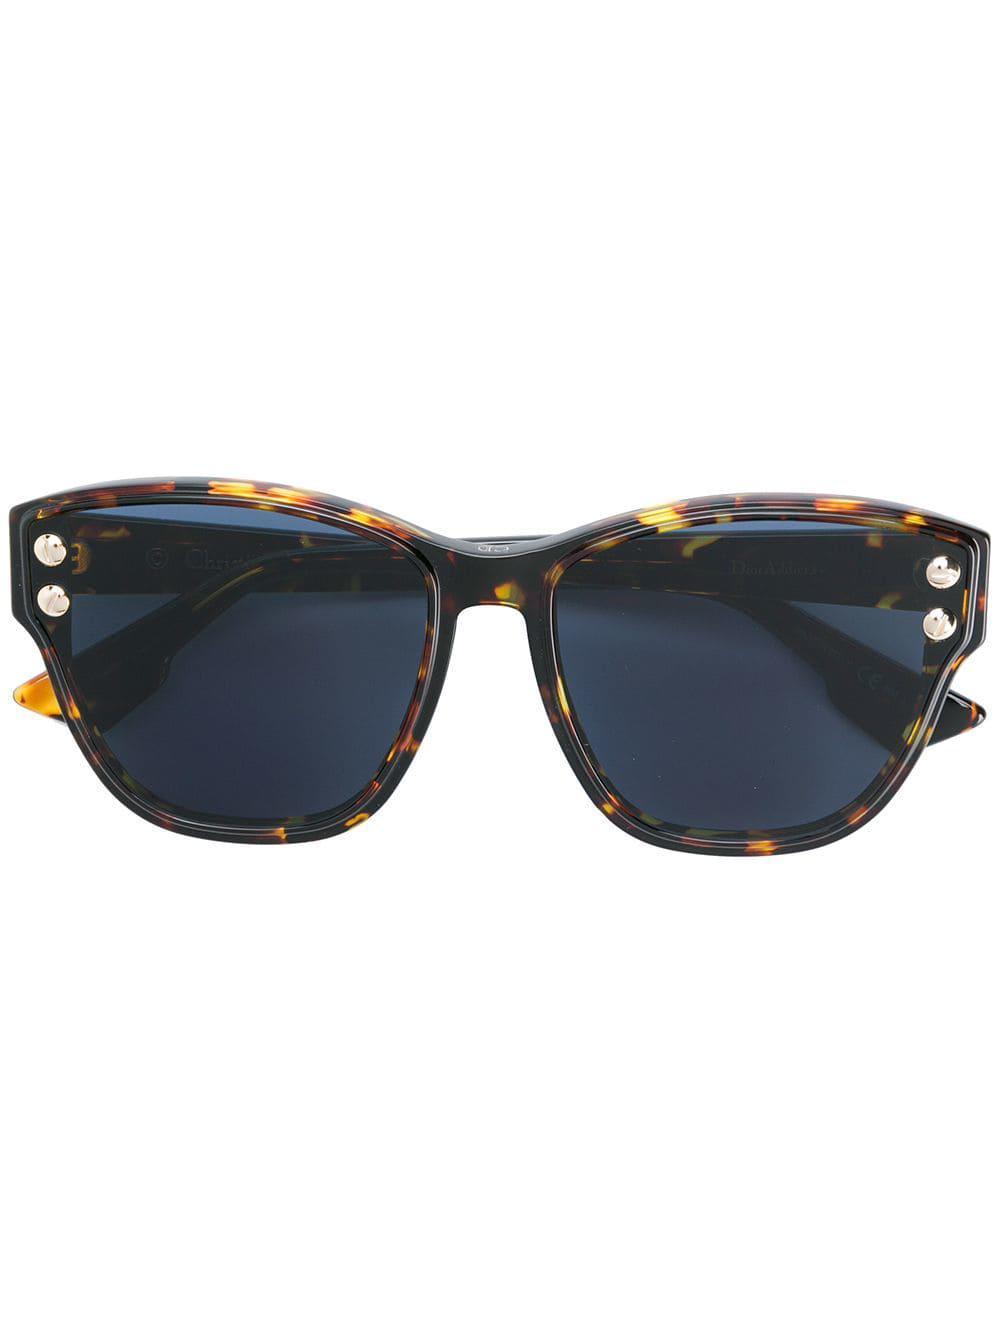 c56a53b4f82 Dior Dior Addict 3 Sunglasses in Brown - Lyst